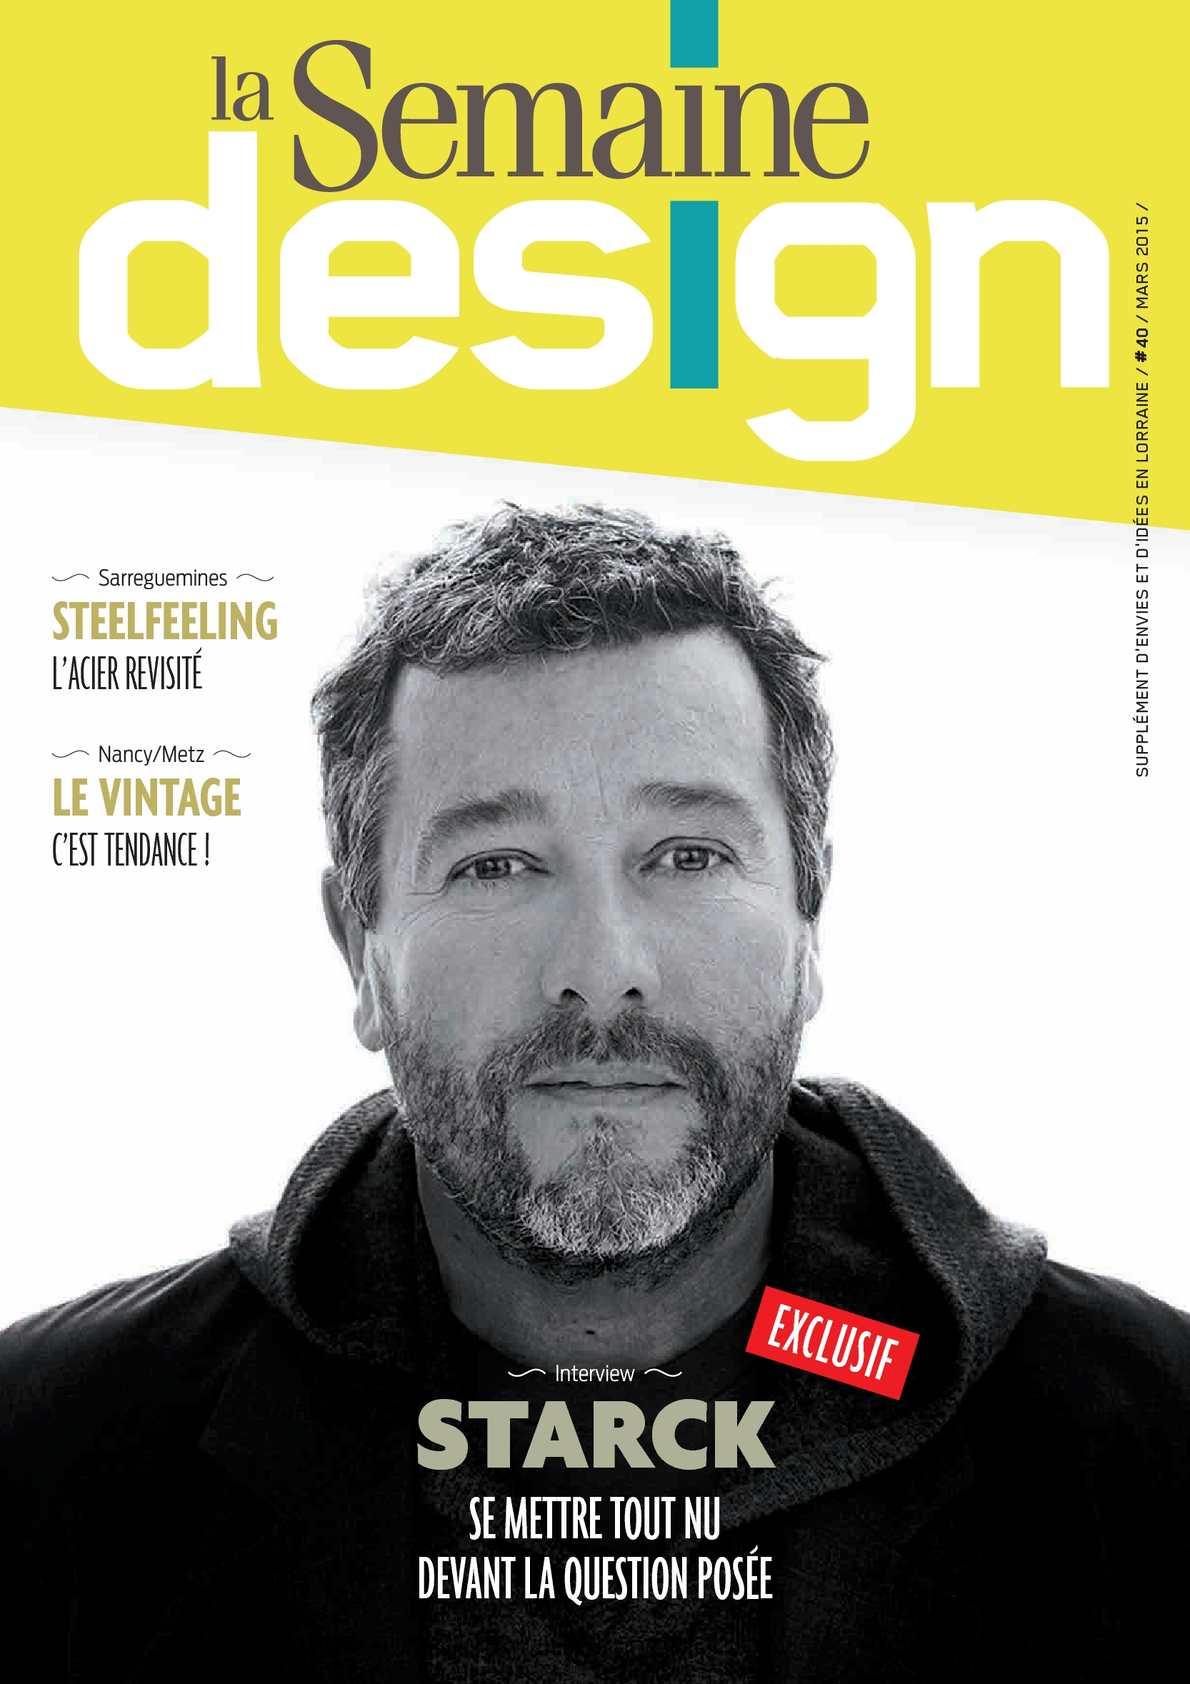 Supplément Design 2015 - La Semaine